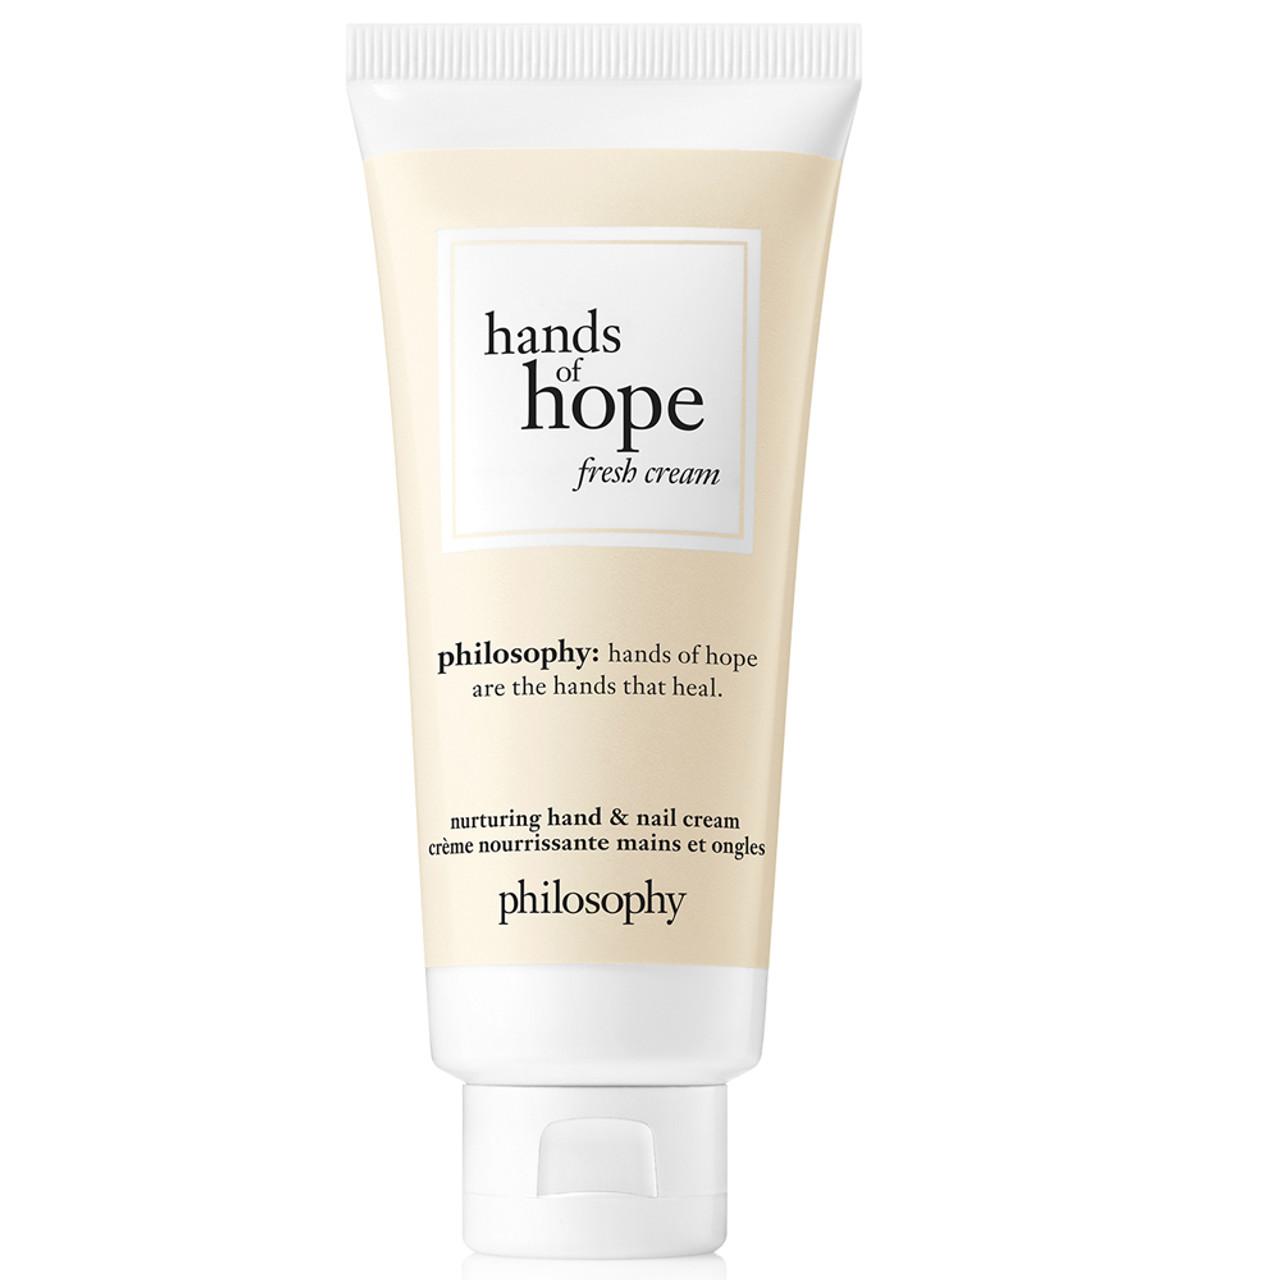 philosophy Hands of Hope Hand Cream - Sparkling Grapefruit